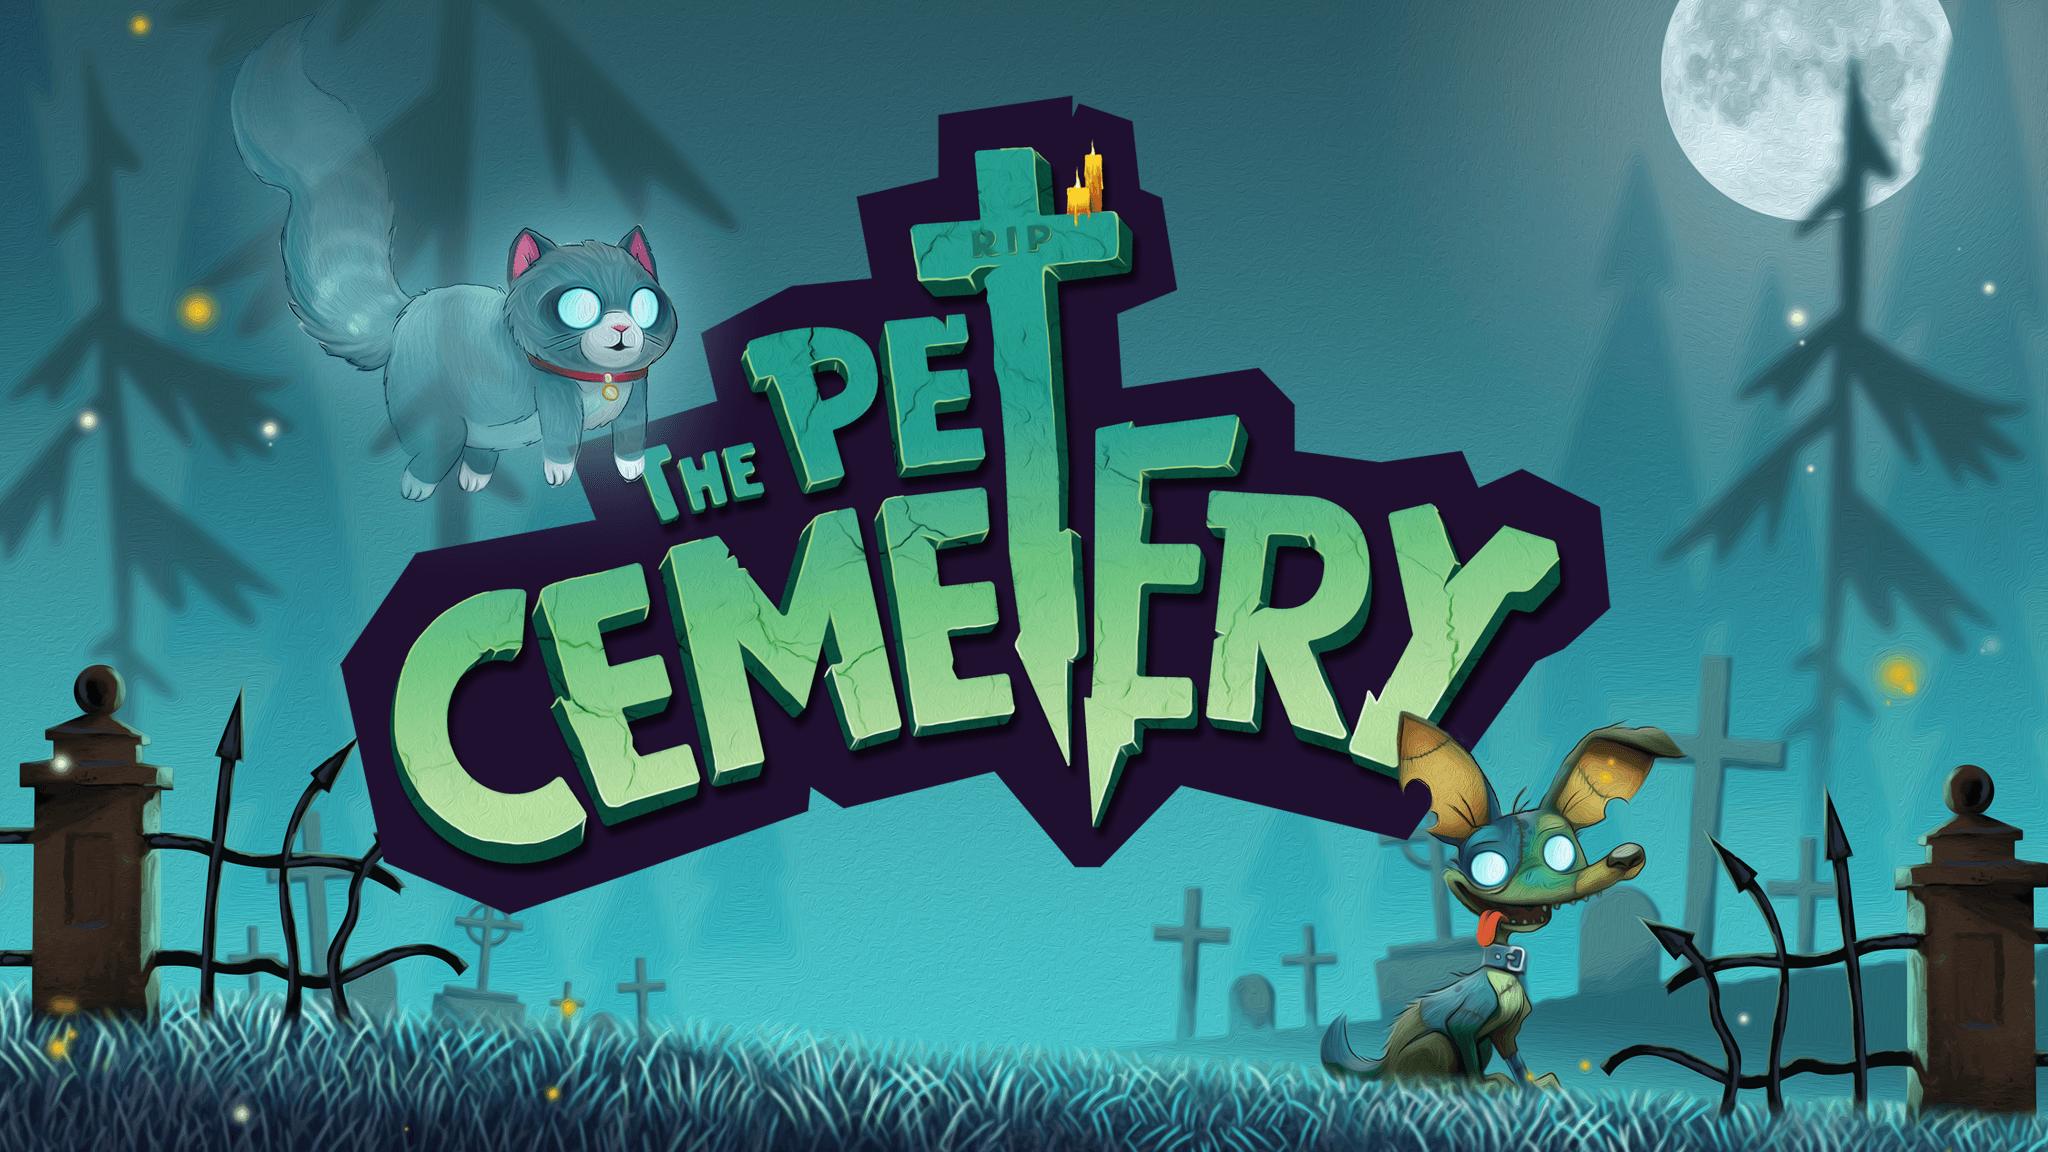 The Pet Cemetery